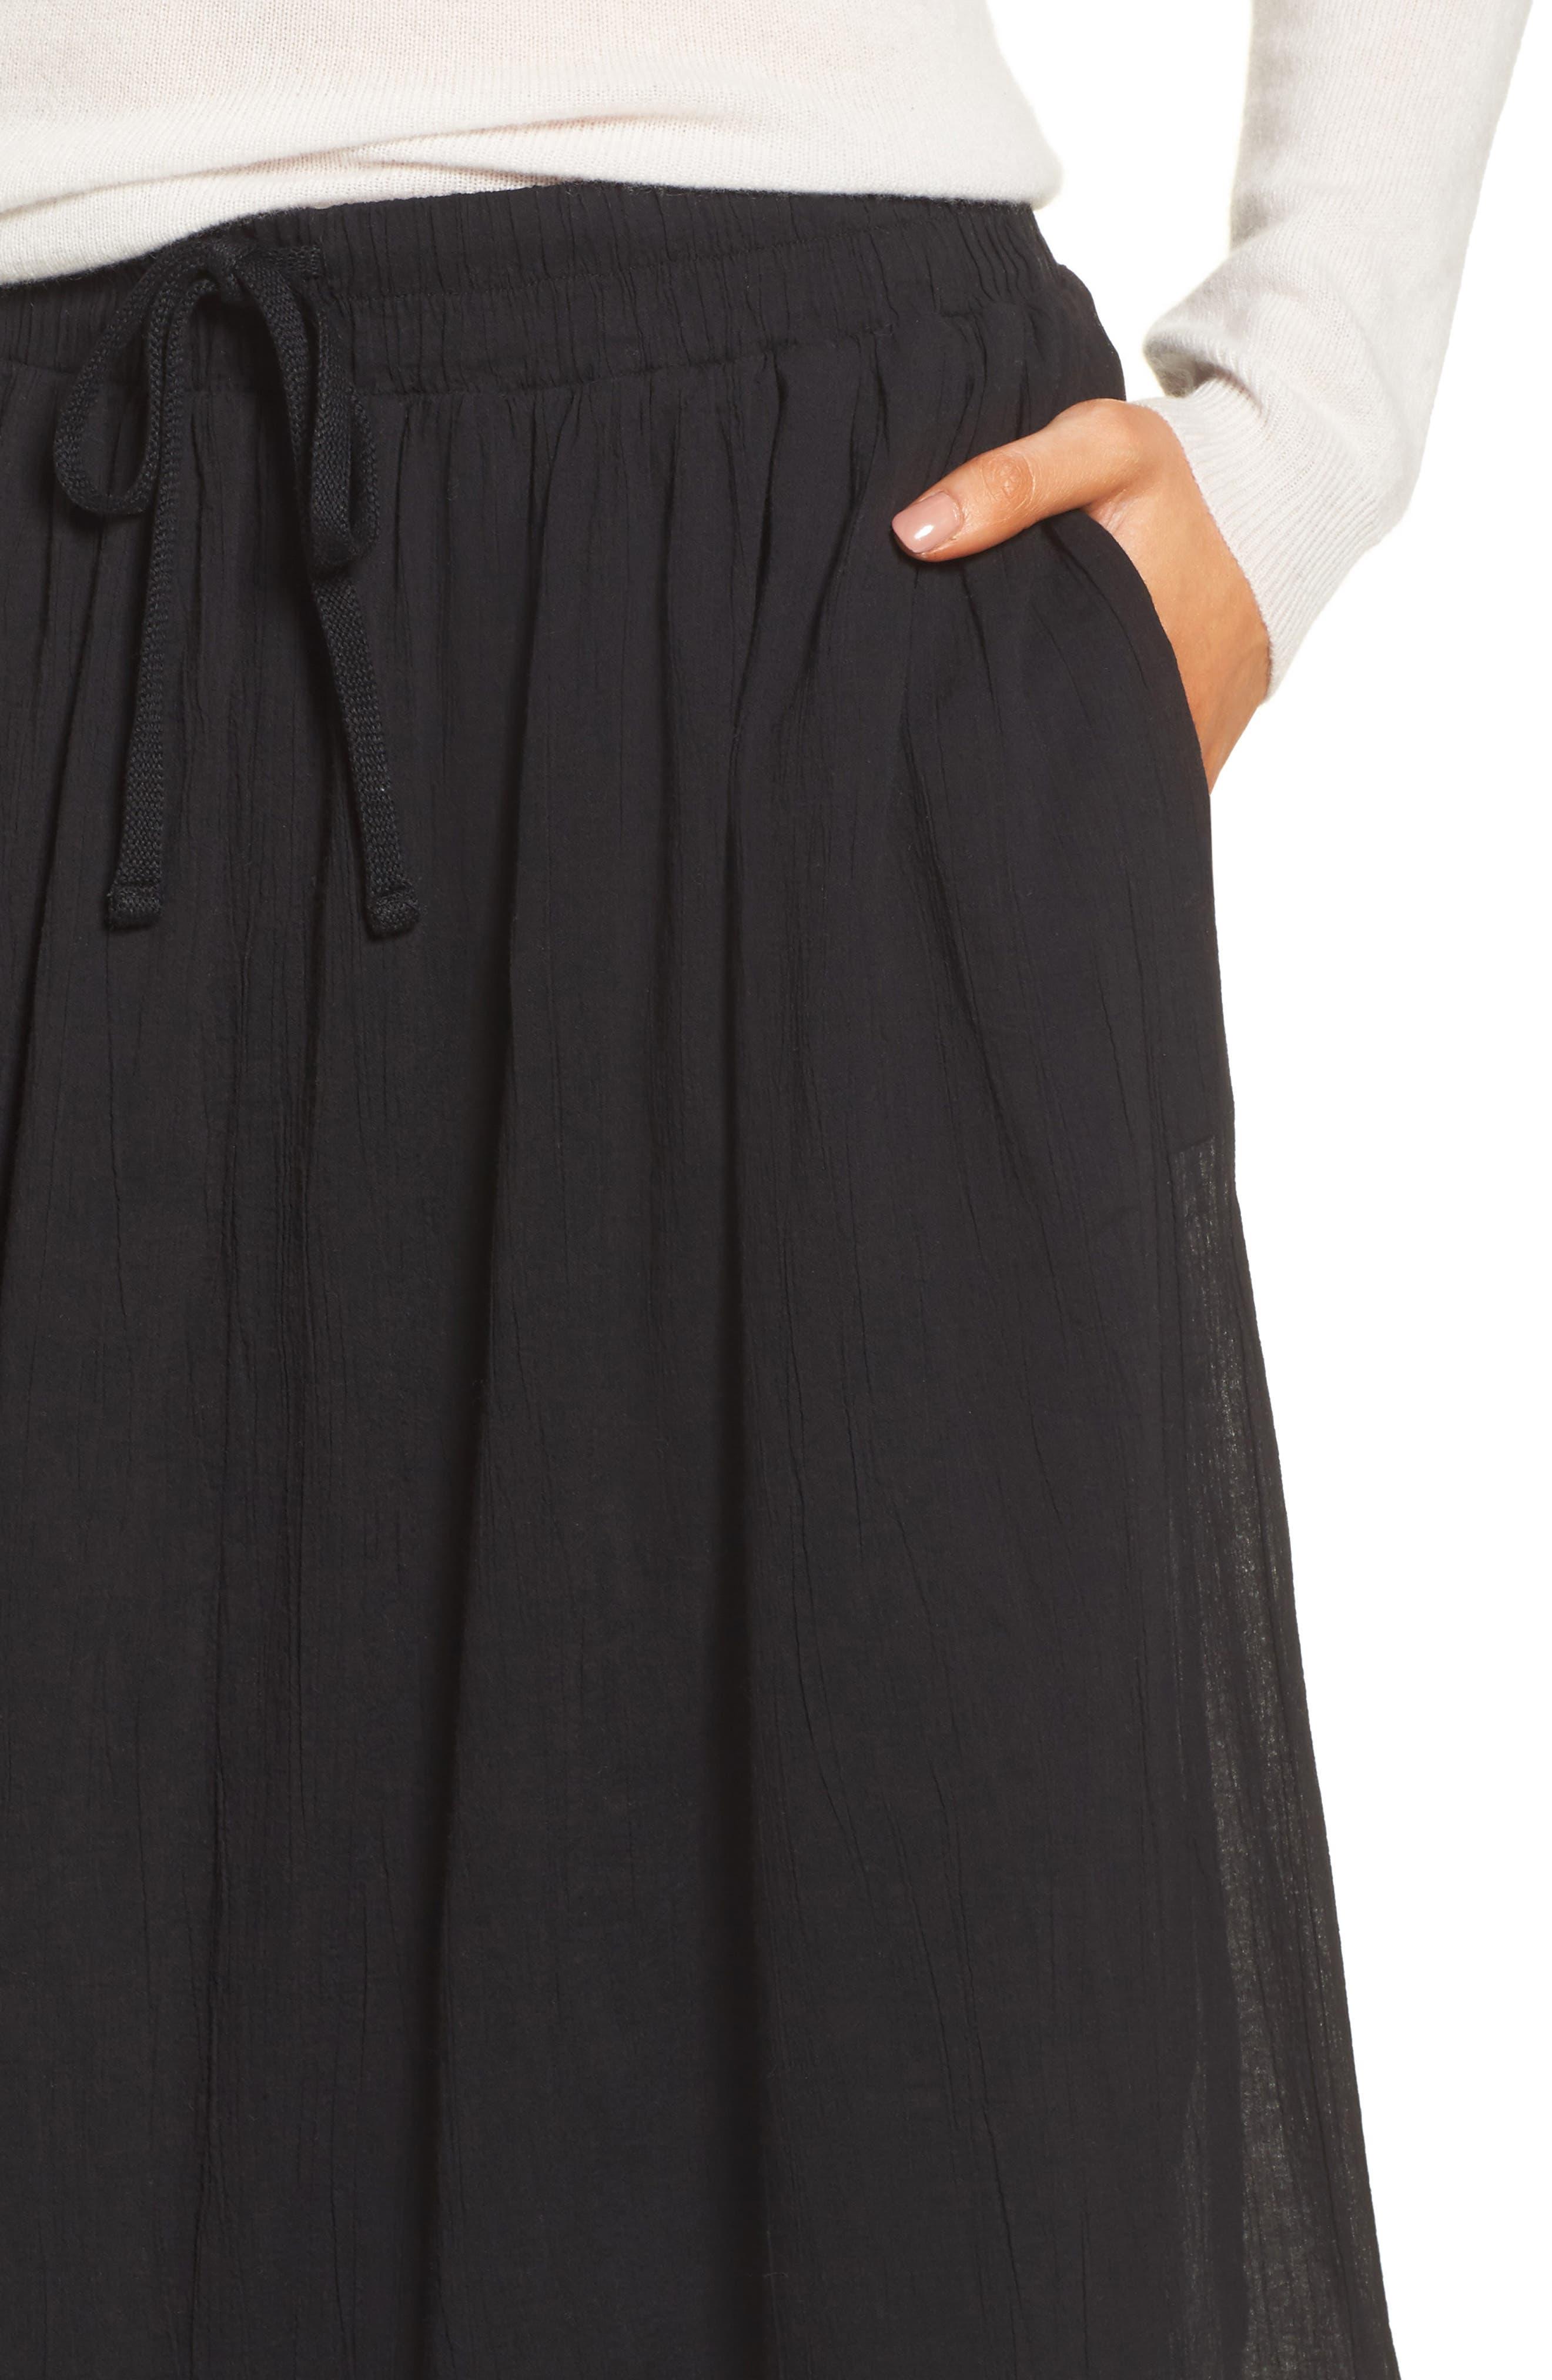 Gauze Midi Skirt,                             Alternate thumbnail 4, color,                             Black